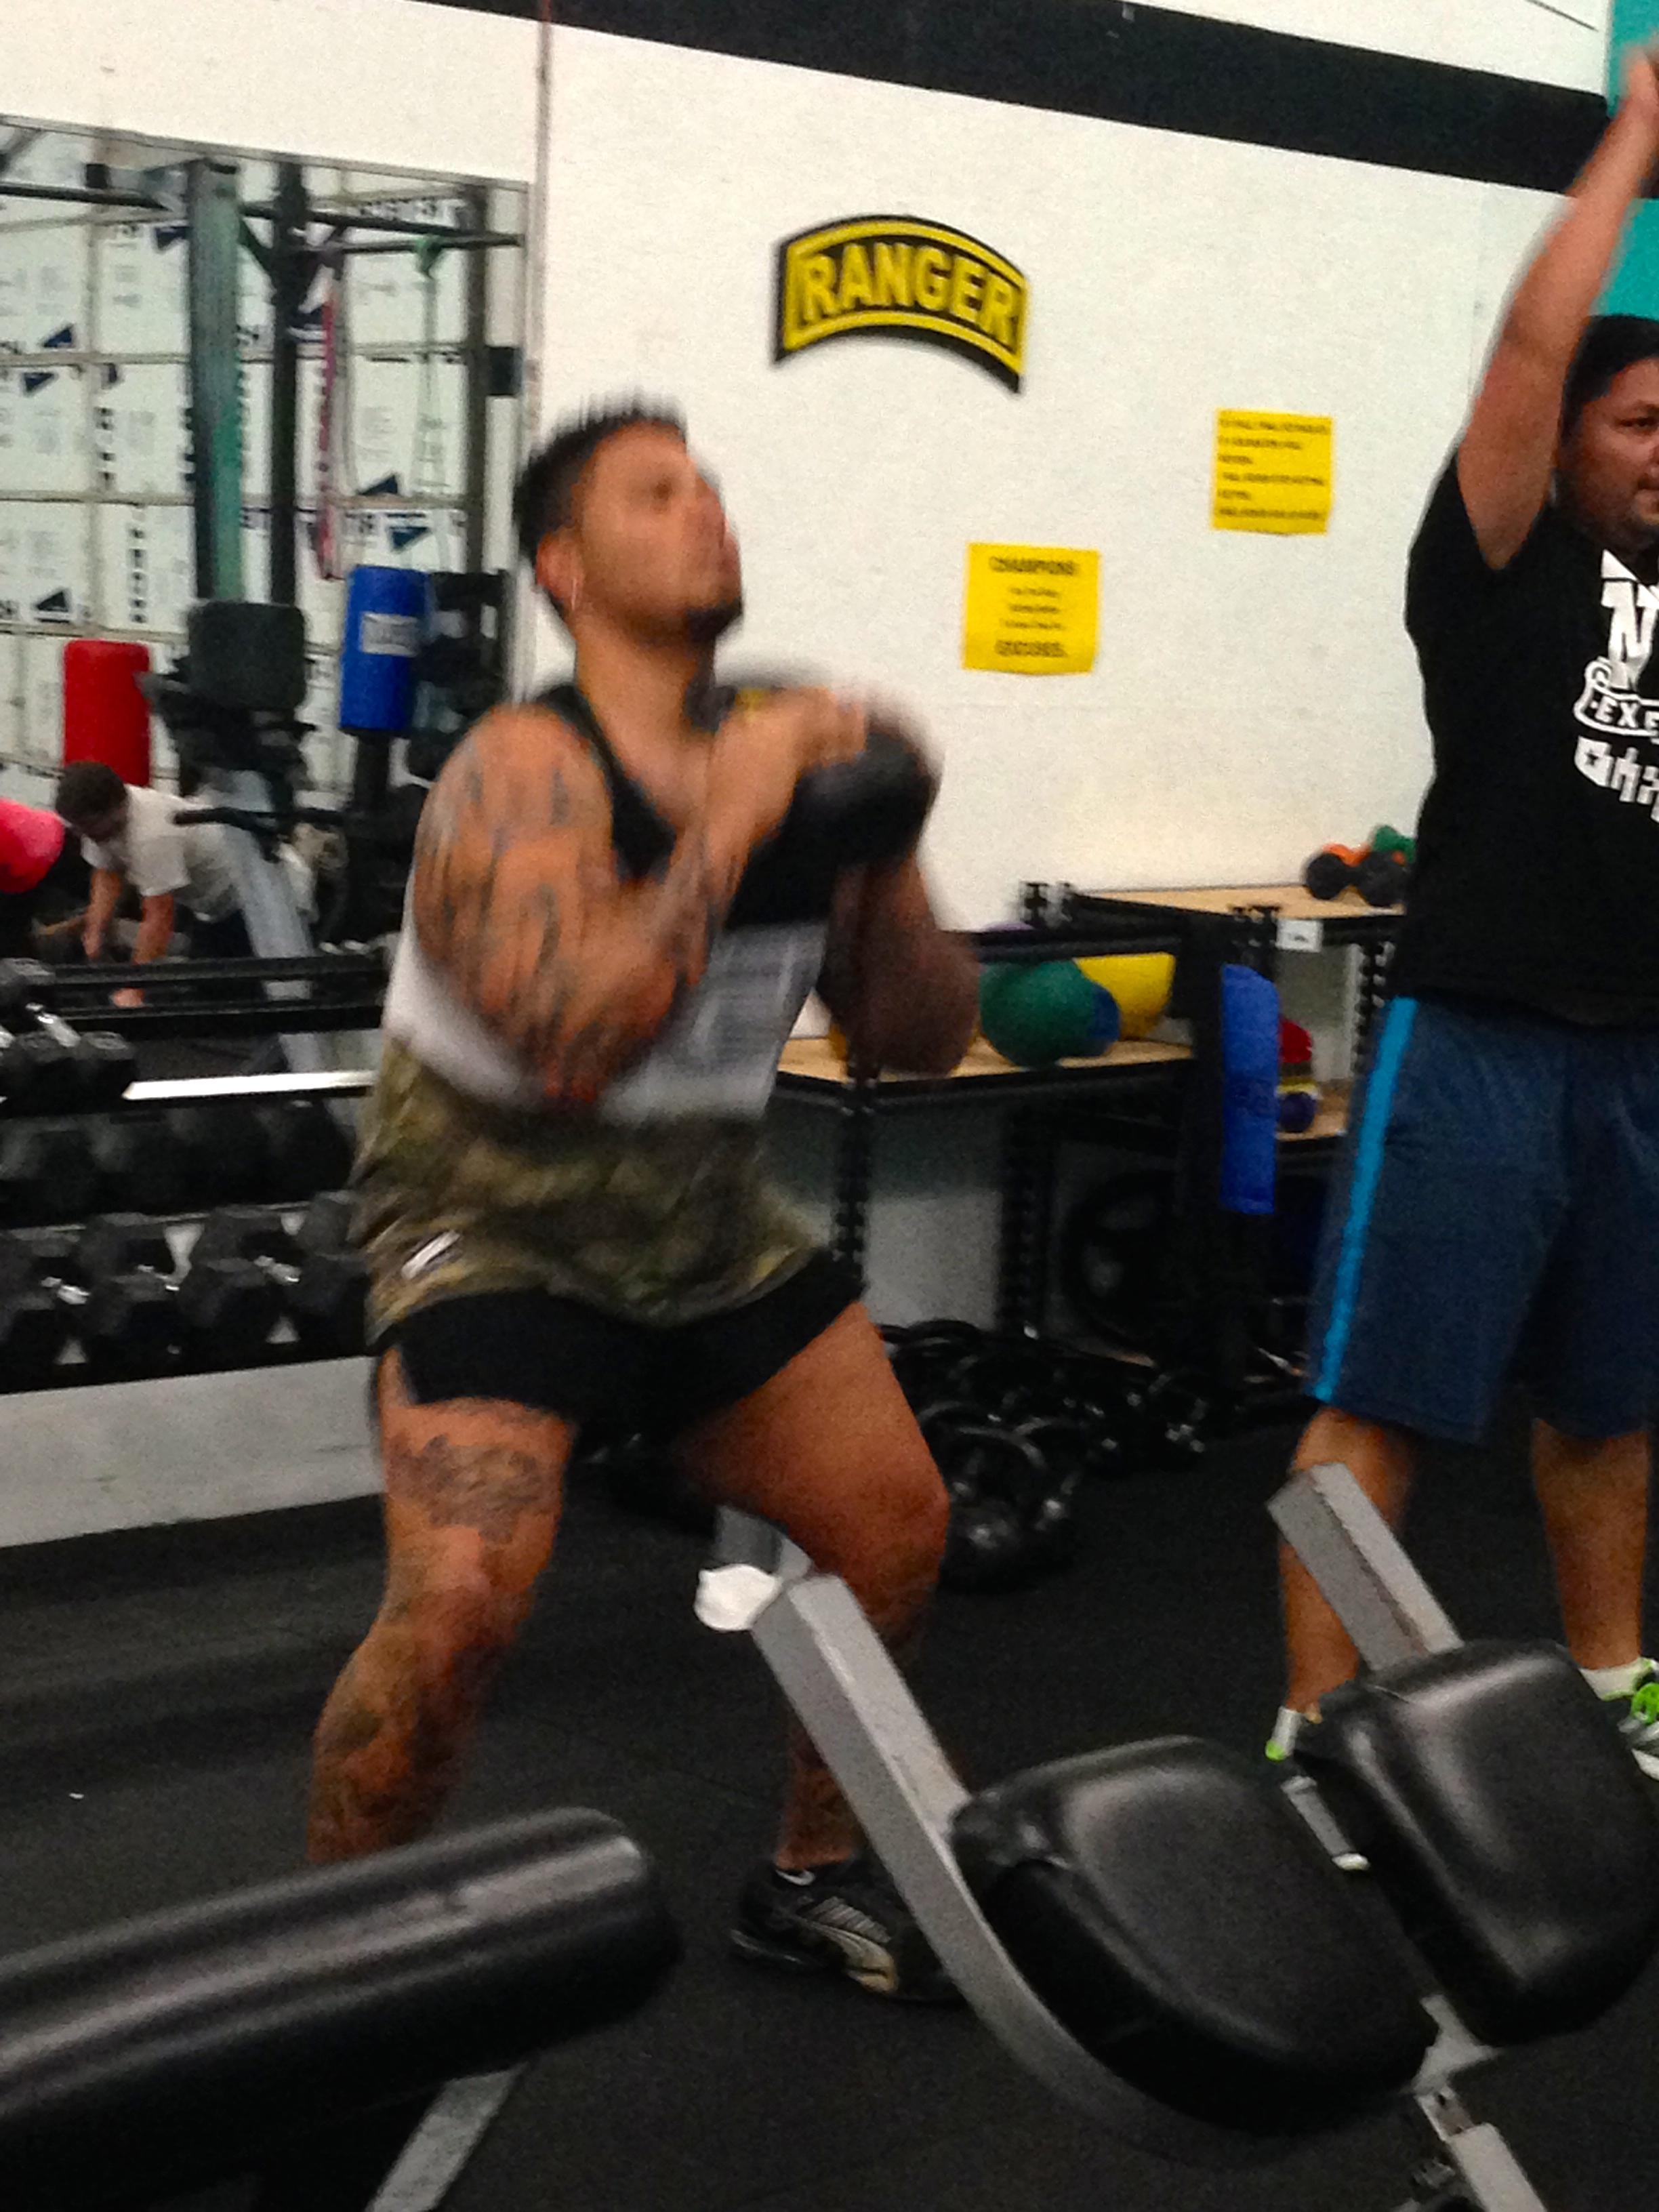 Group TrainingBoot Camp Class Info Edge Fitness